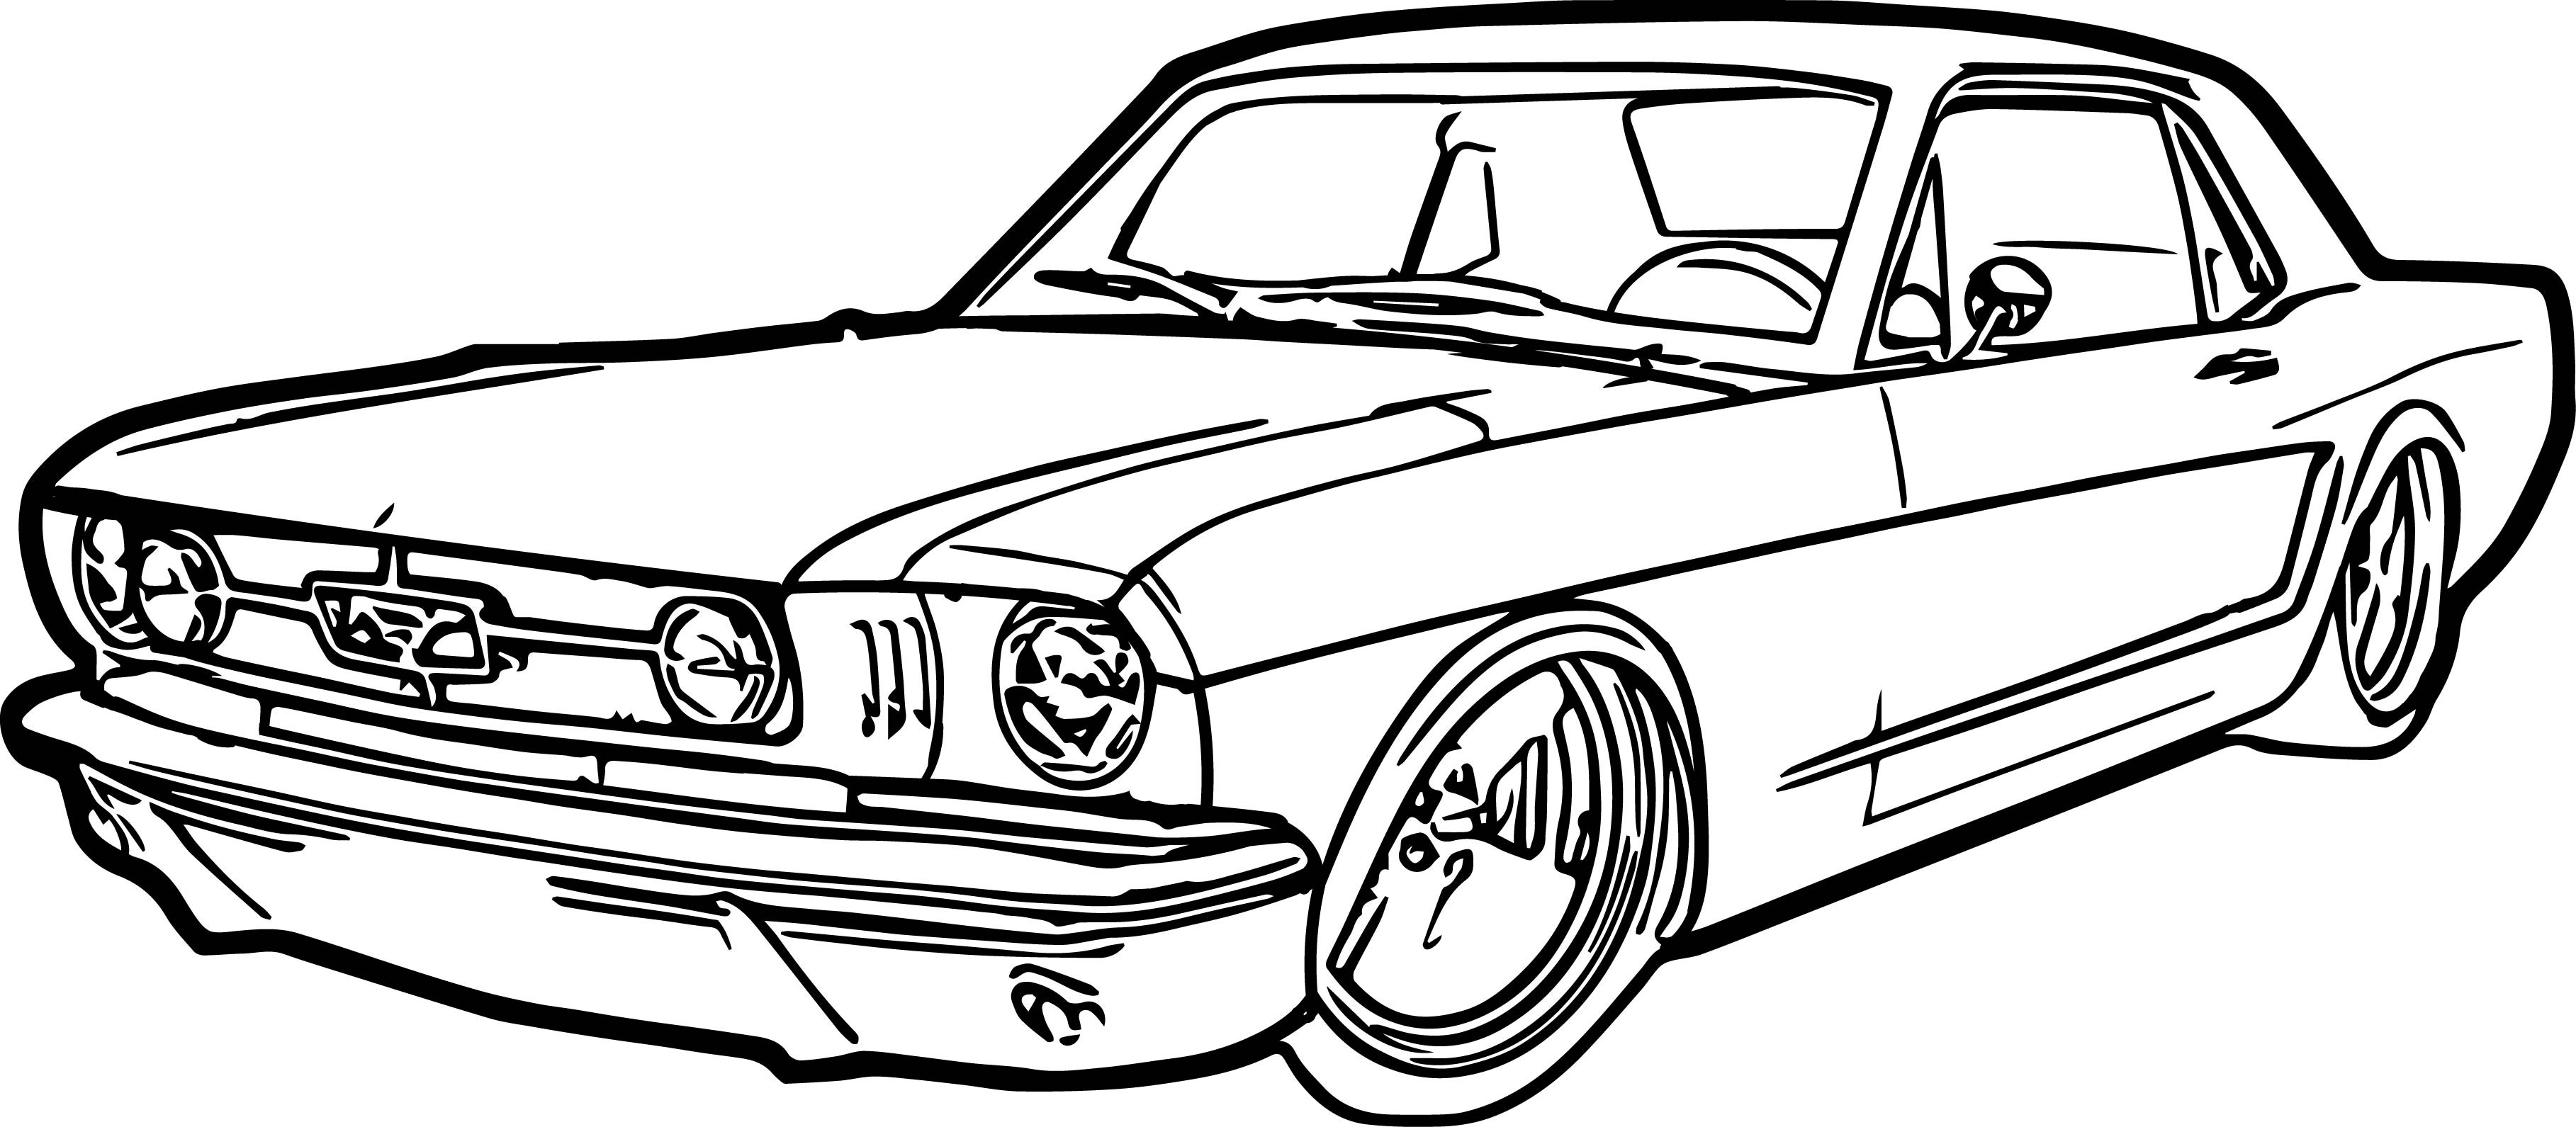 camaro drawing at getdrawings free for personal use camaro 54 Chevy Car 3635x1591 cool car coloring page new super car chevrolet camaro coloring